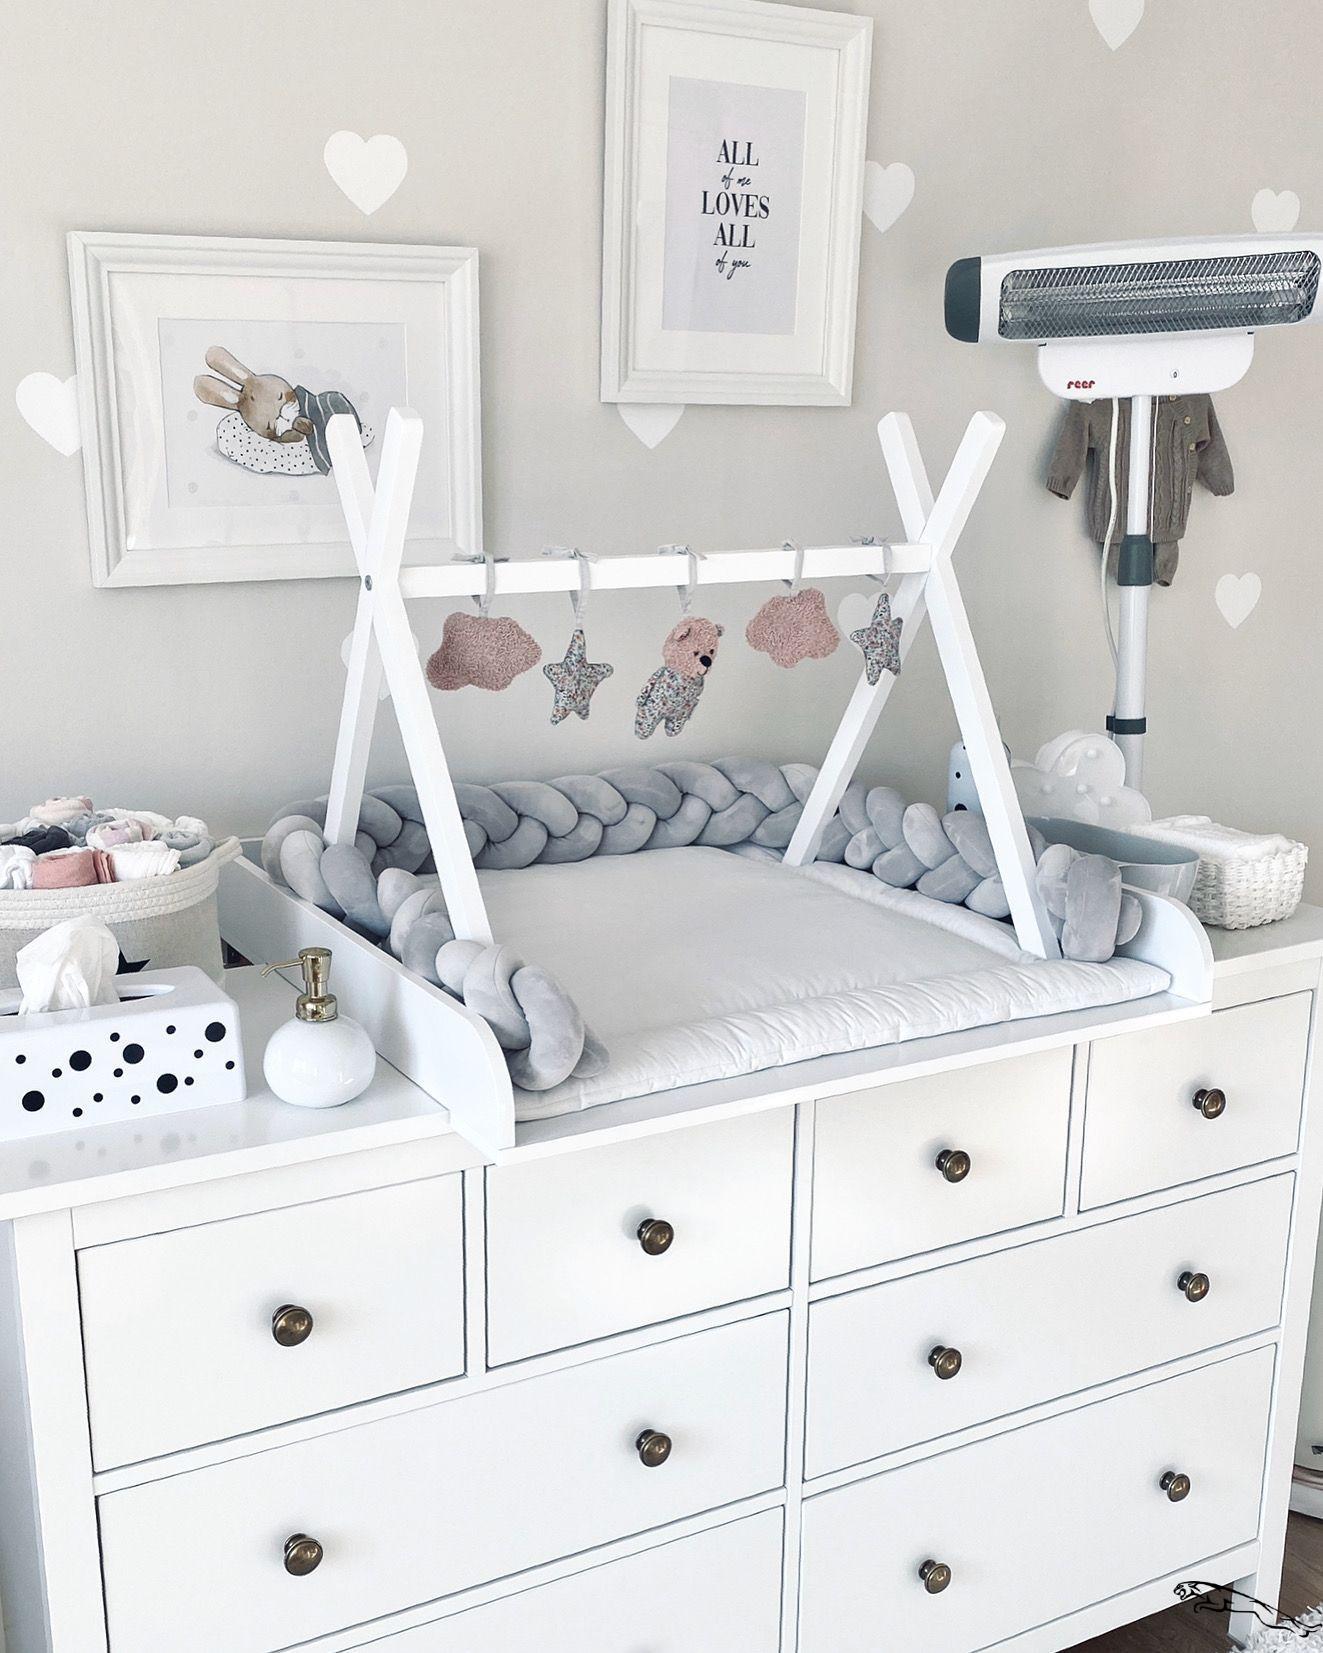 Pin by Andi on Lakás in 2020 | Modern baby room, Nursery